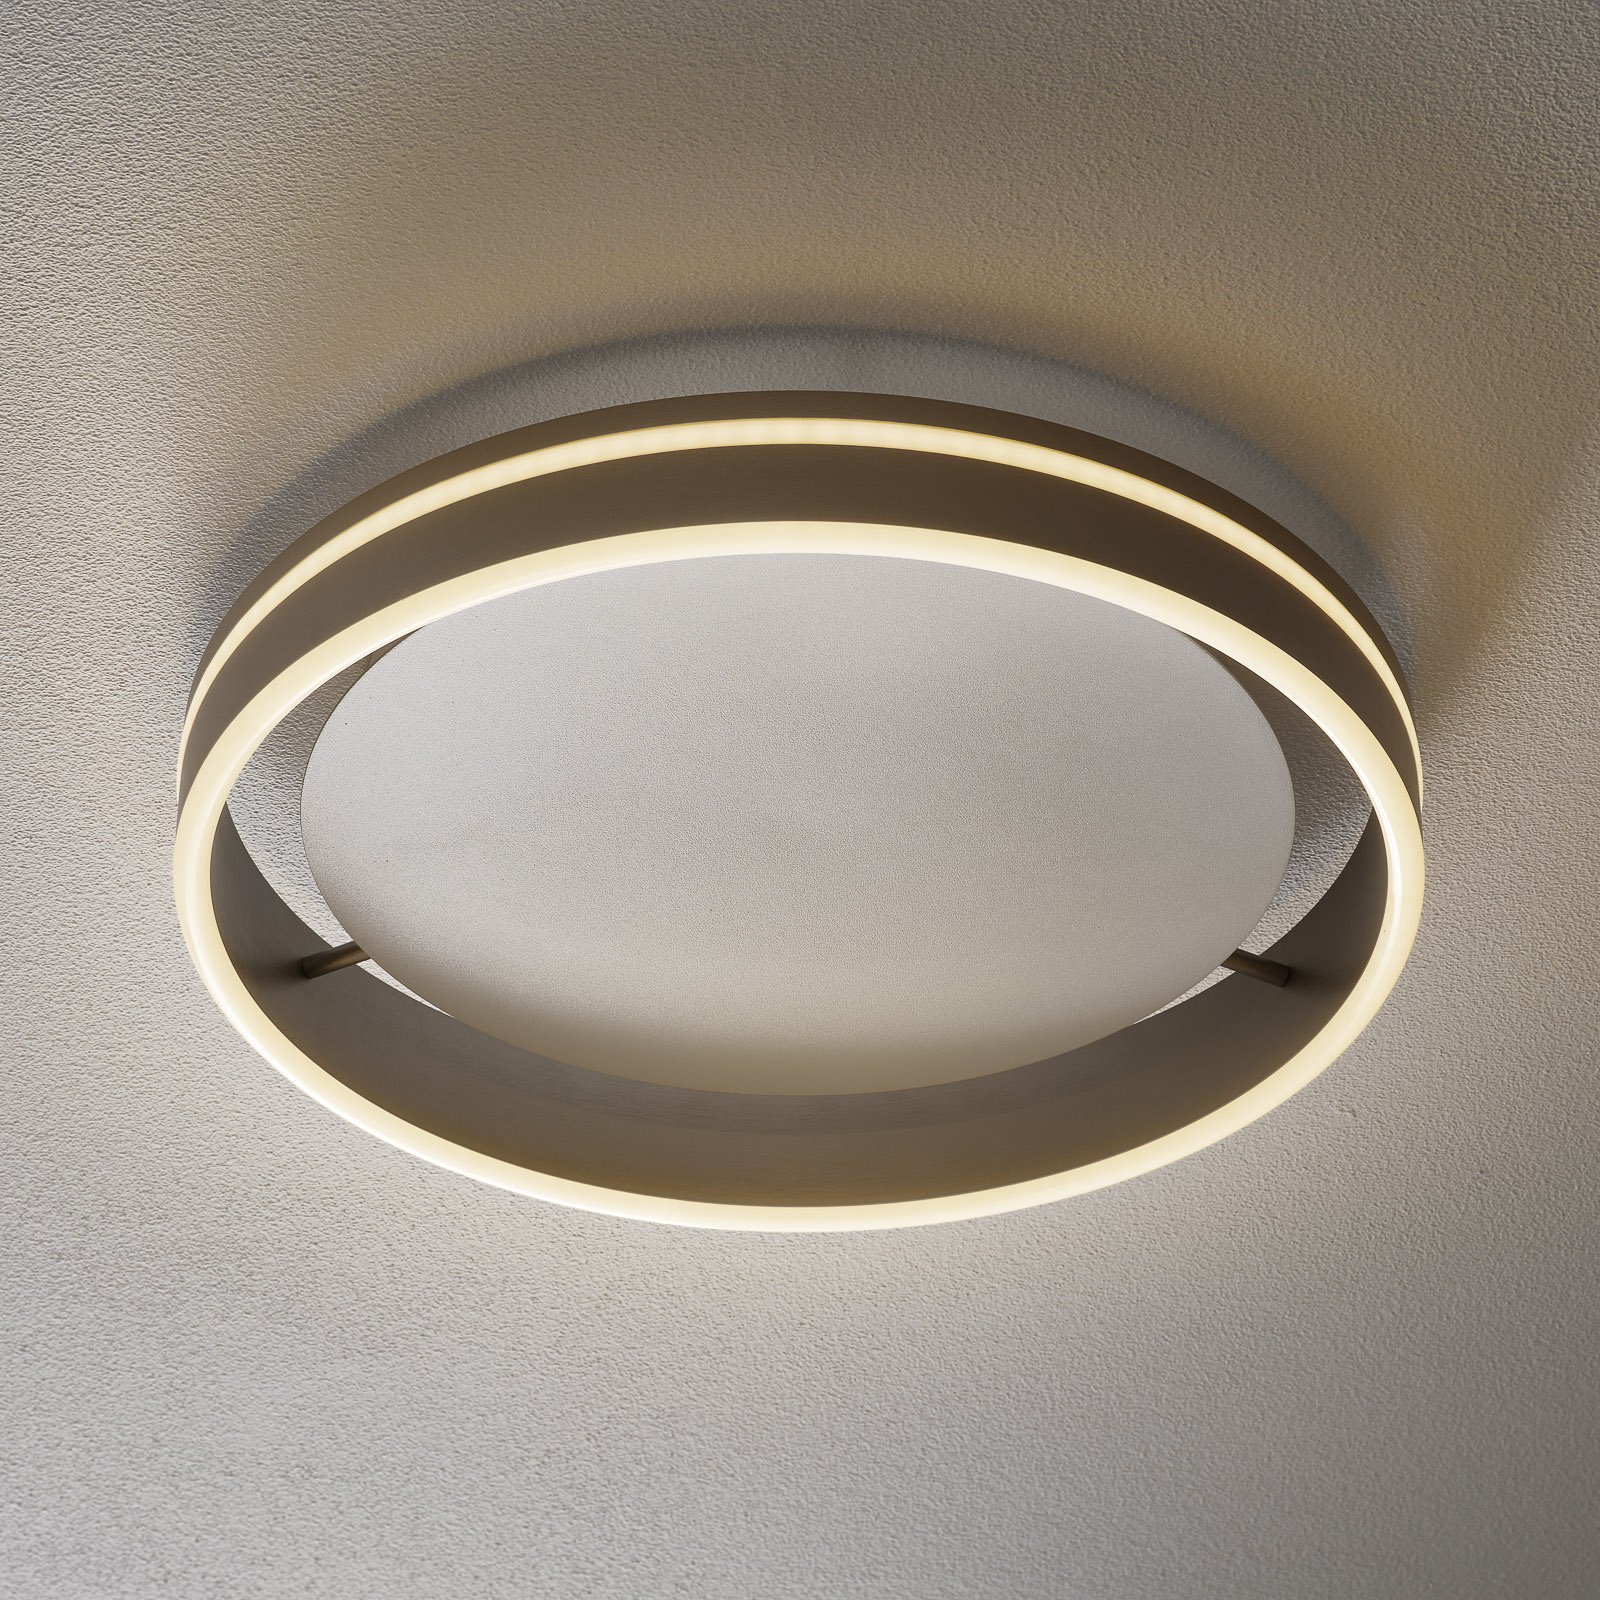 Paul Neuhaus Q-VITO LED-taklampe 40 cm stål